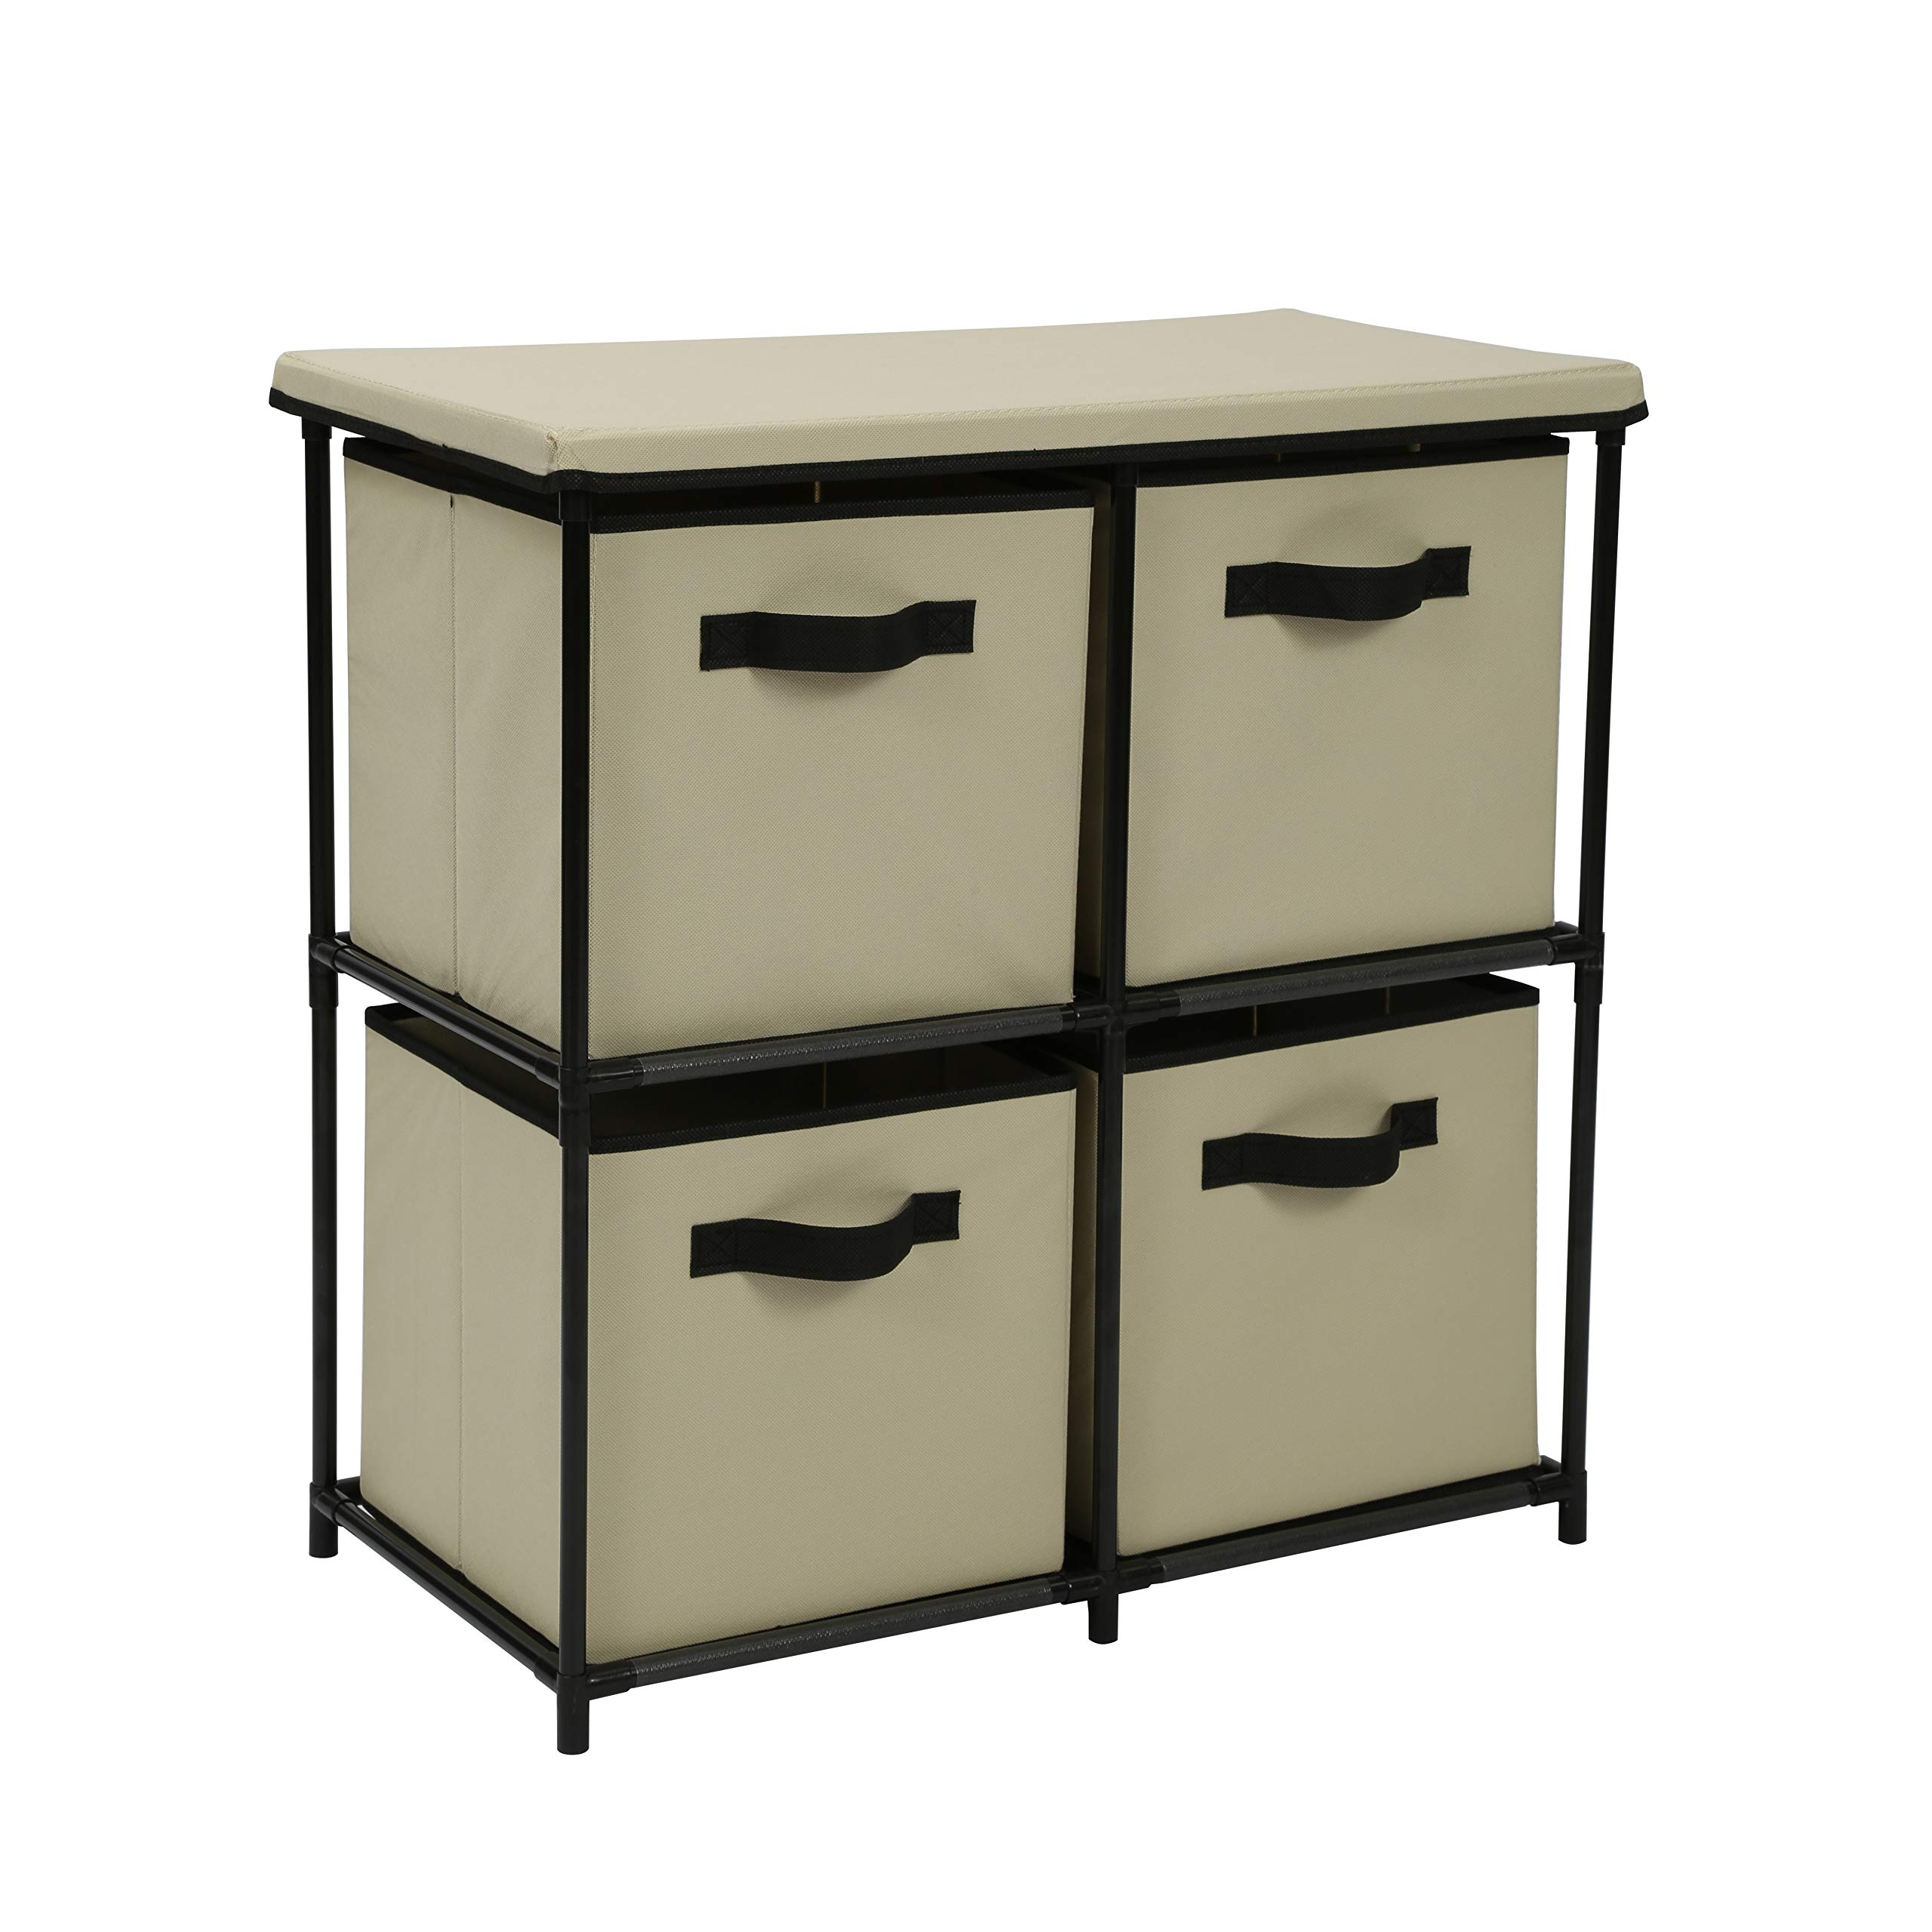 Homebi Drawers Storage Shelf Chest Unit Storage Cabinet Closet Organizer Rack Dresser Storage Towel with Non-Woven Fabric Bins (Beige 4-Drawer) by HOME BI